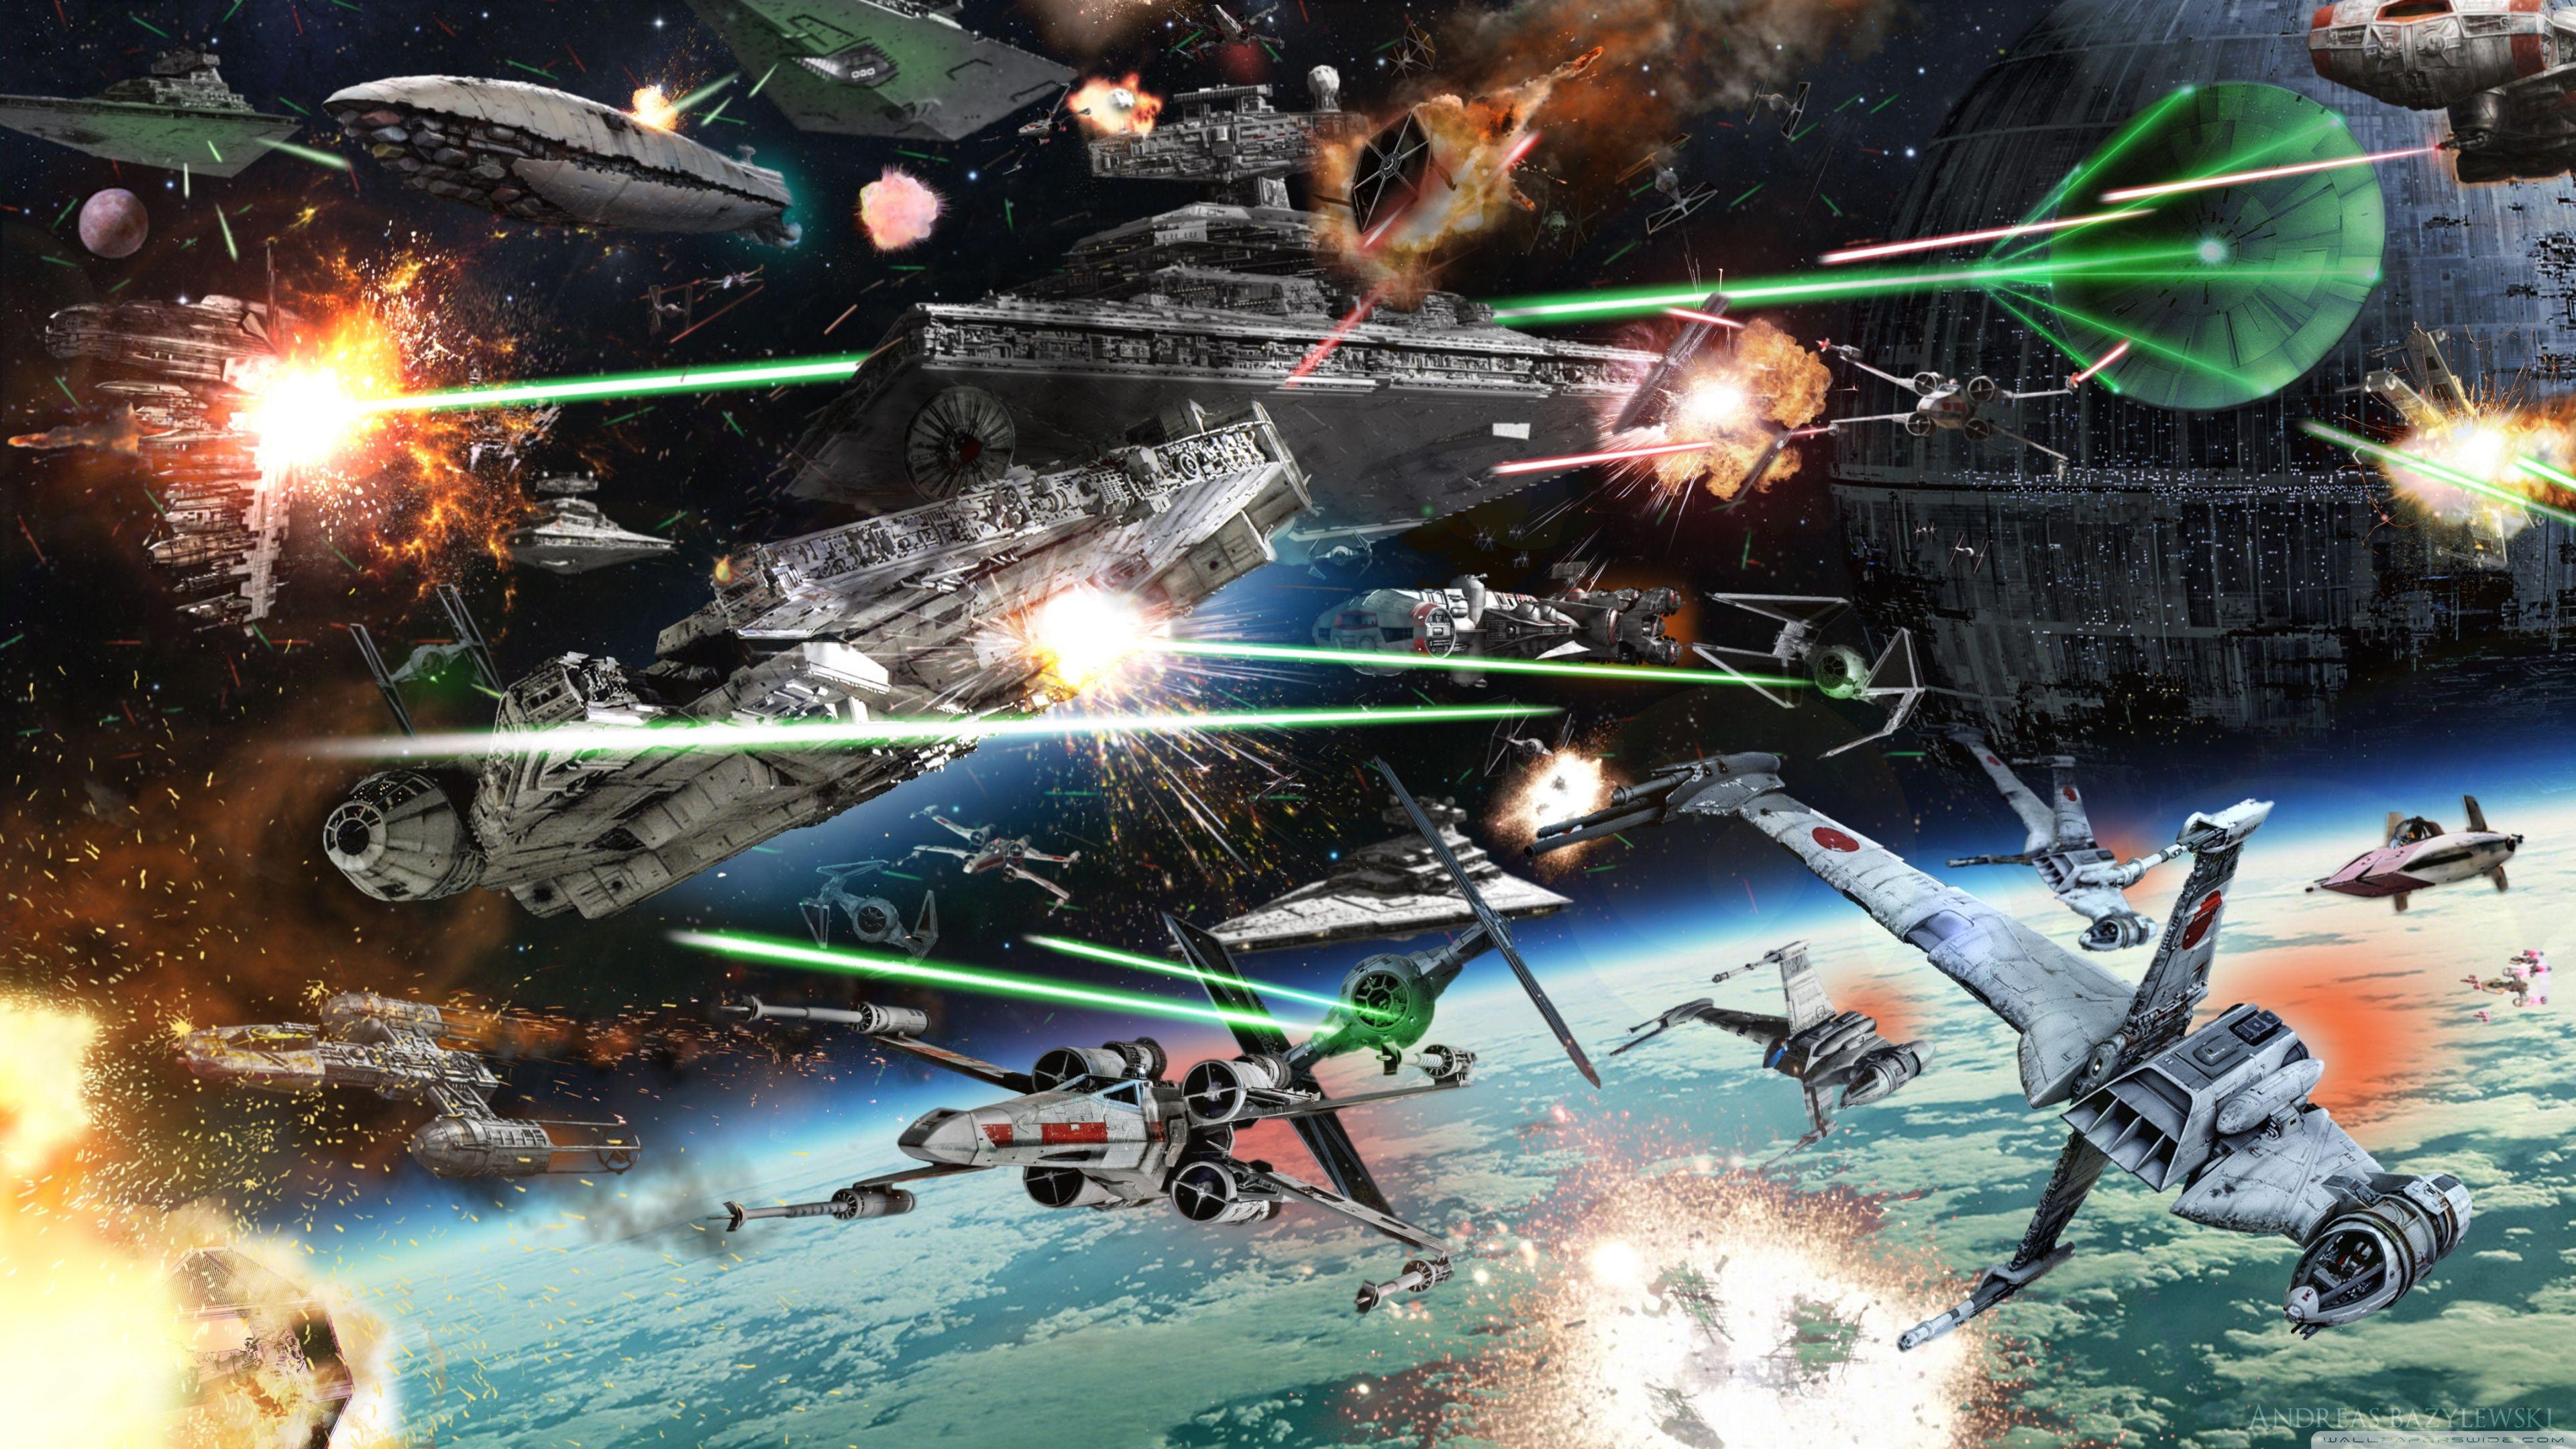 1440p Star Wars Desktop Background 1637022 Hd Wallpaper Backgrounds Download